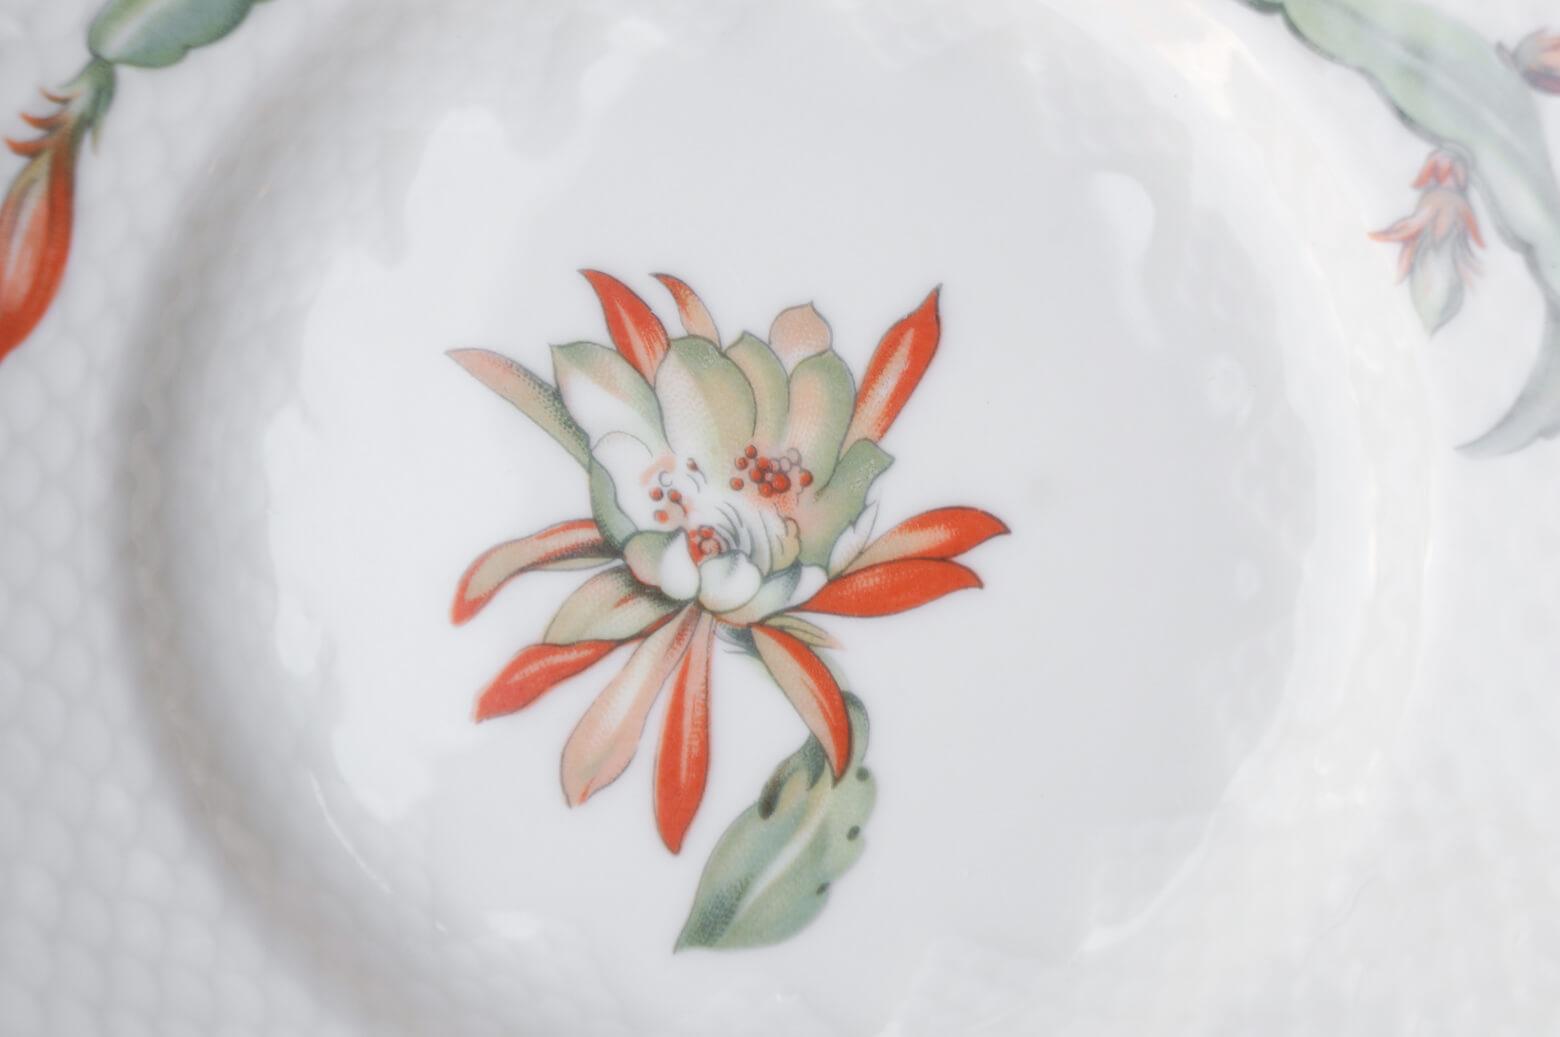 Bing&Grondahl Cactus/ビングオーグレンダール カクタス ケーキプレート 2